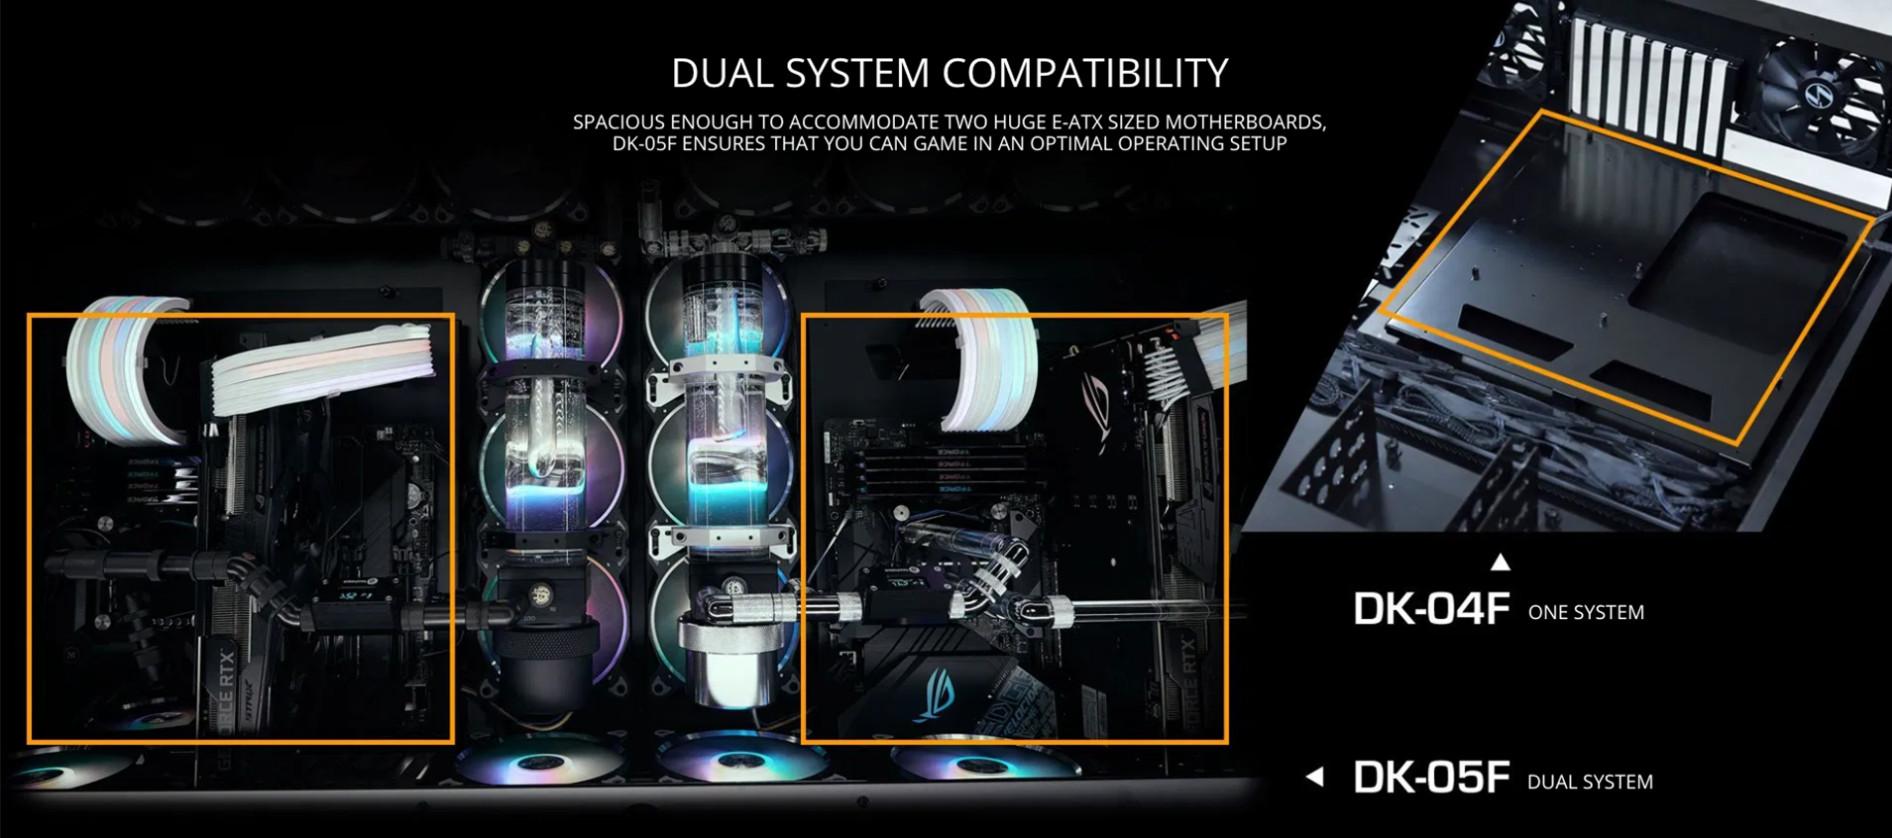 Bàn Gaming Desk Lian-Li DK-05FX giới thiệu 13